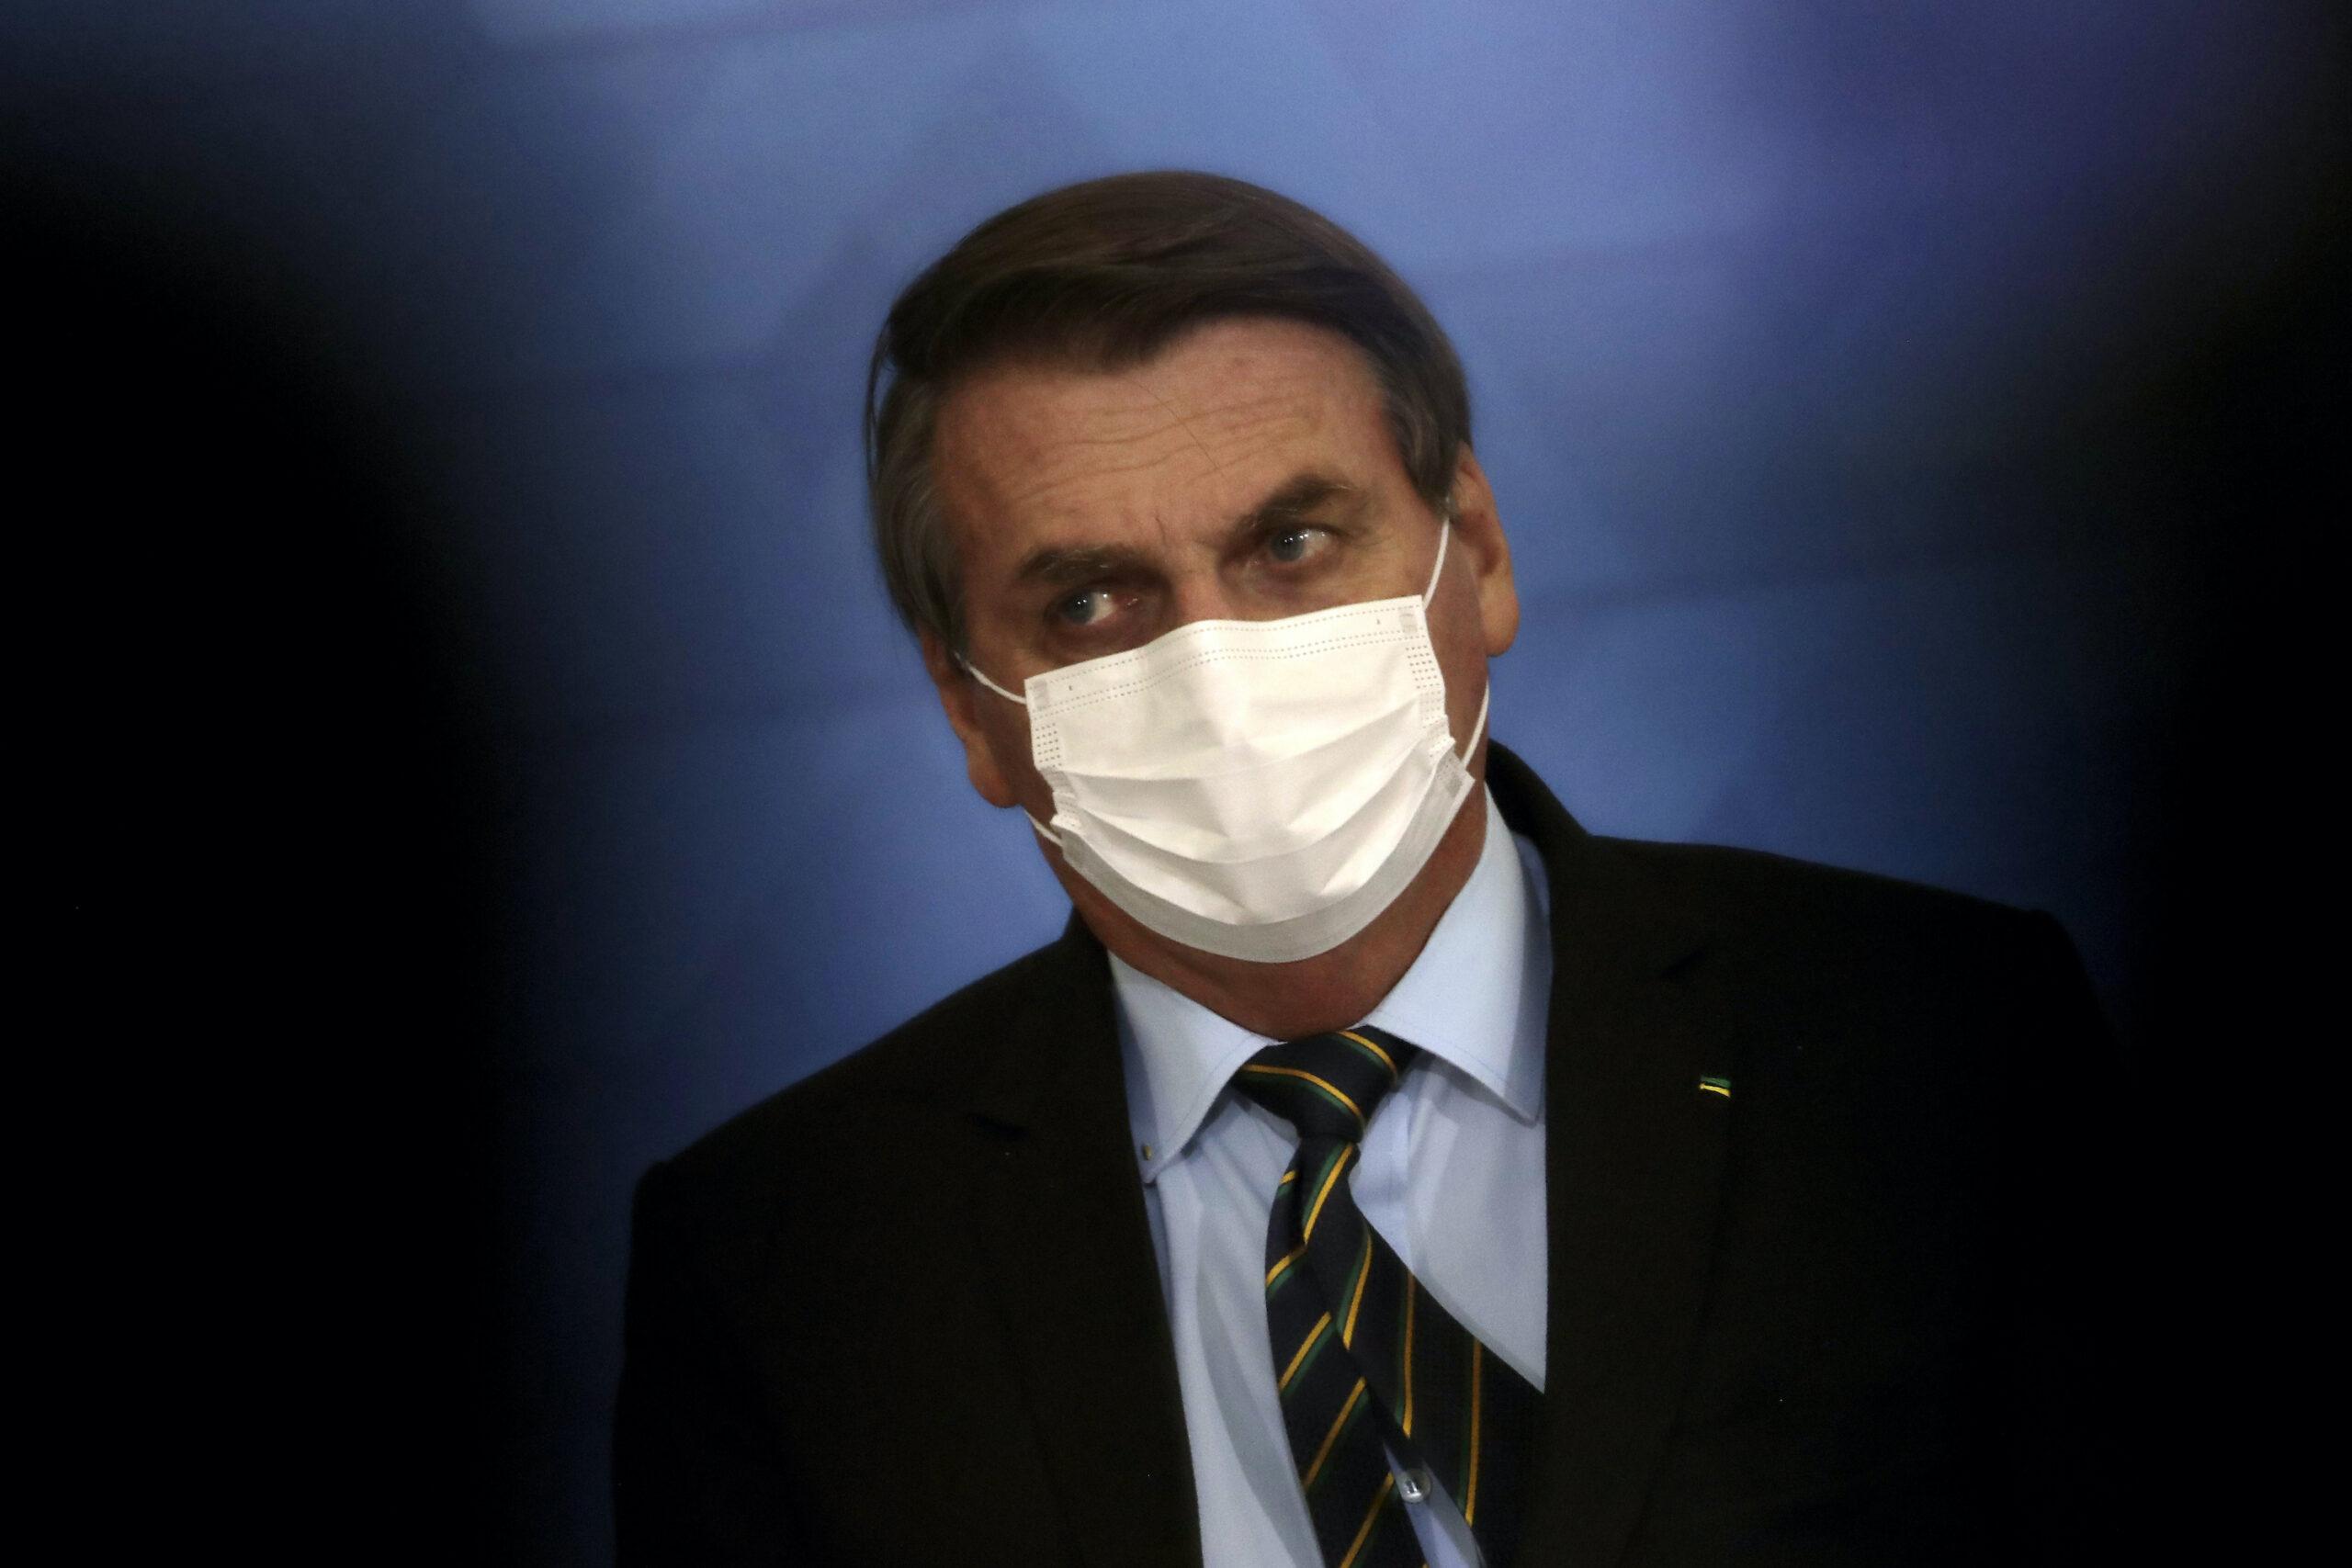 bolsonaro crisi politica brasile